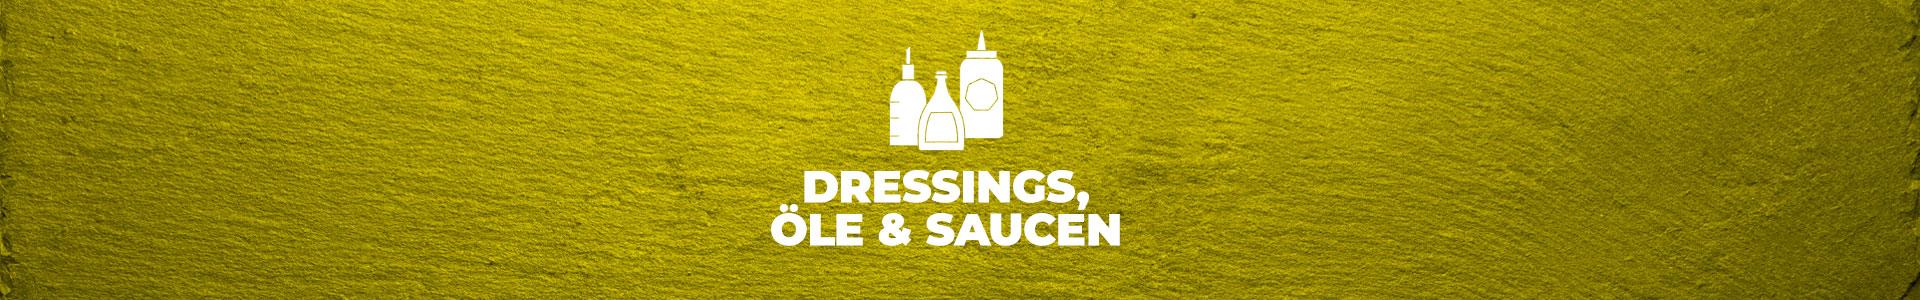 Dressings, Öle & Saucen